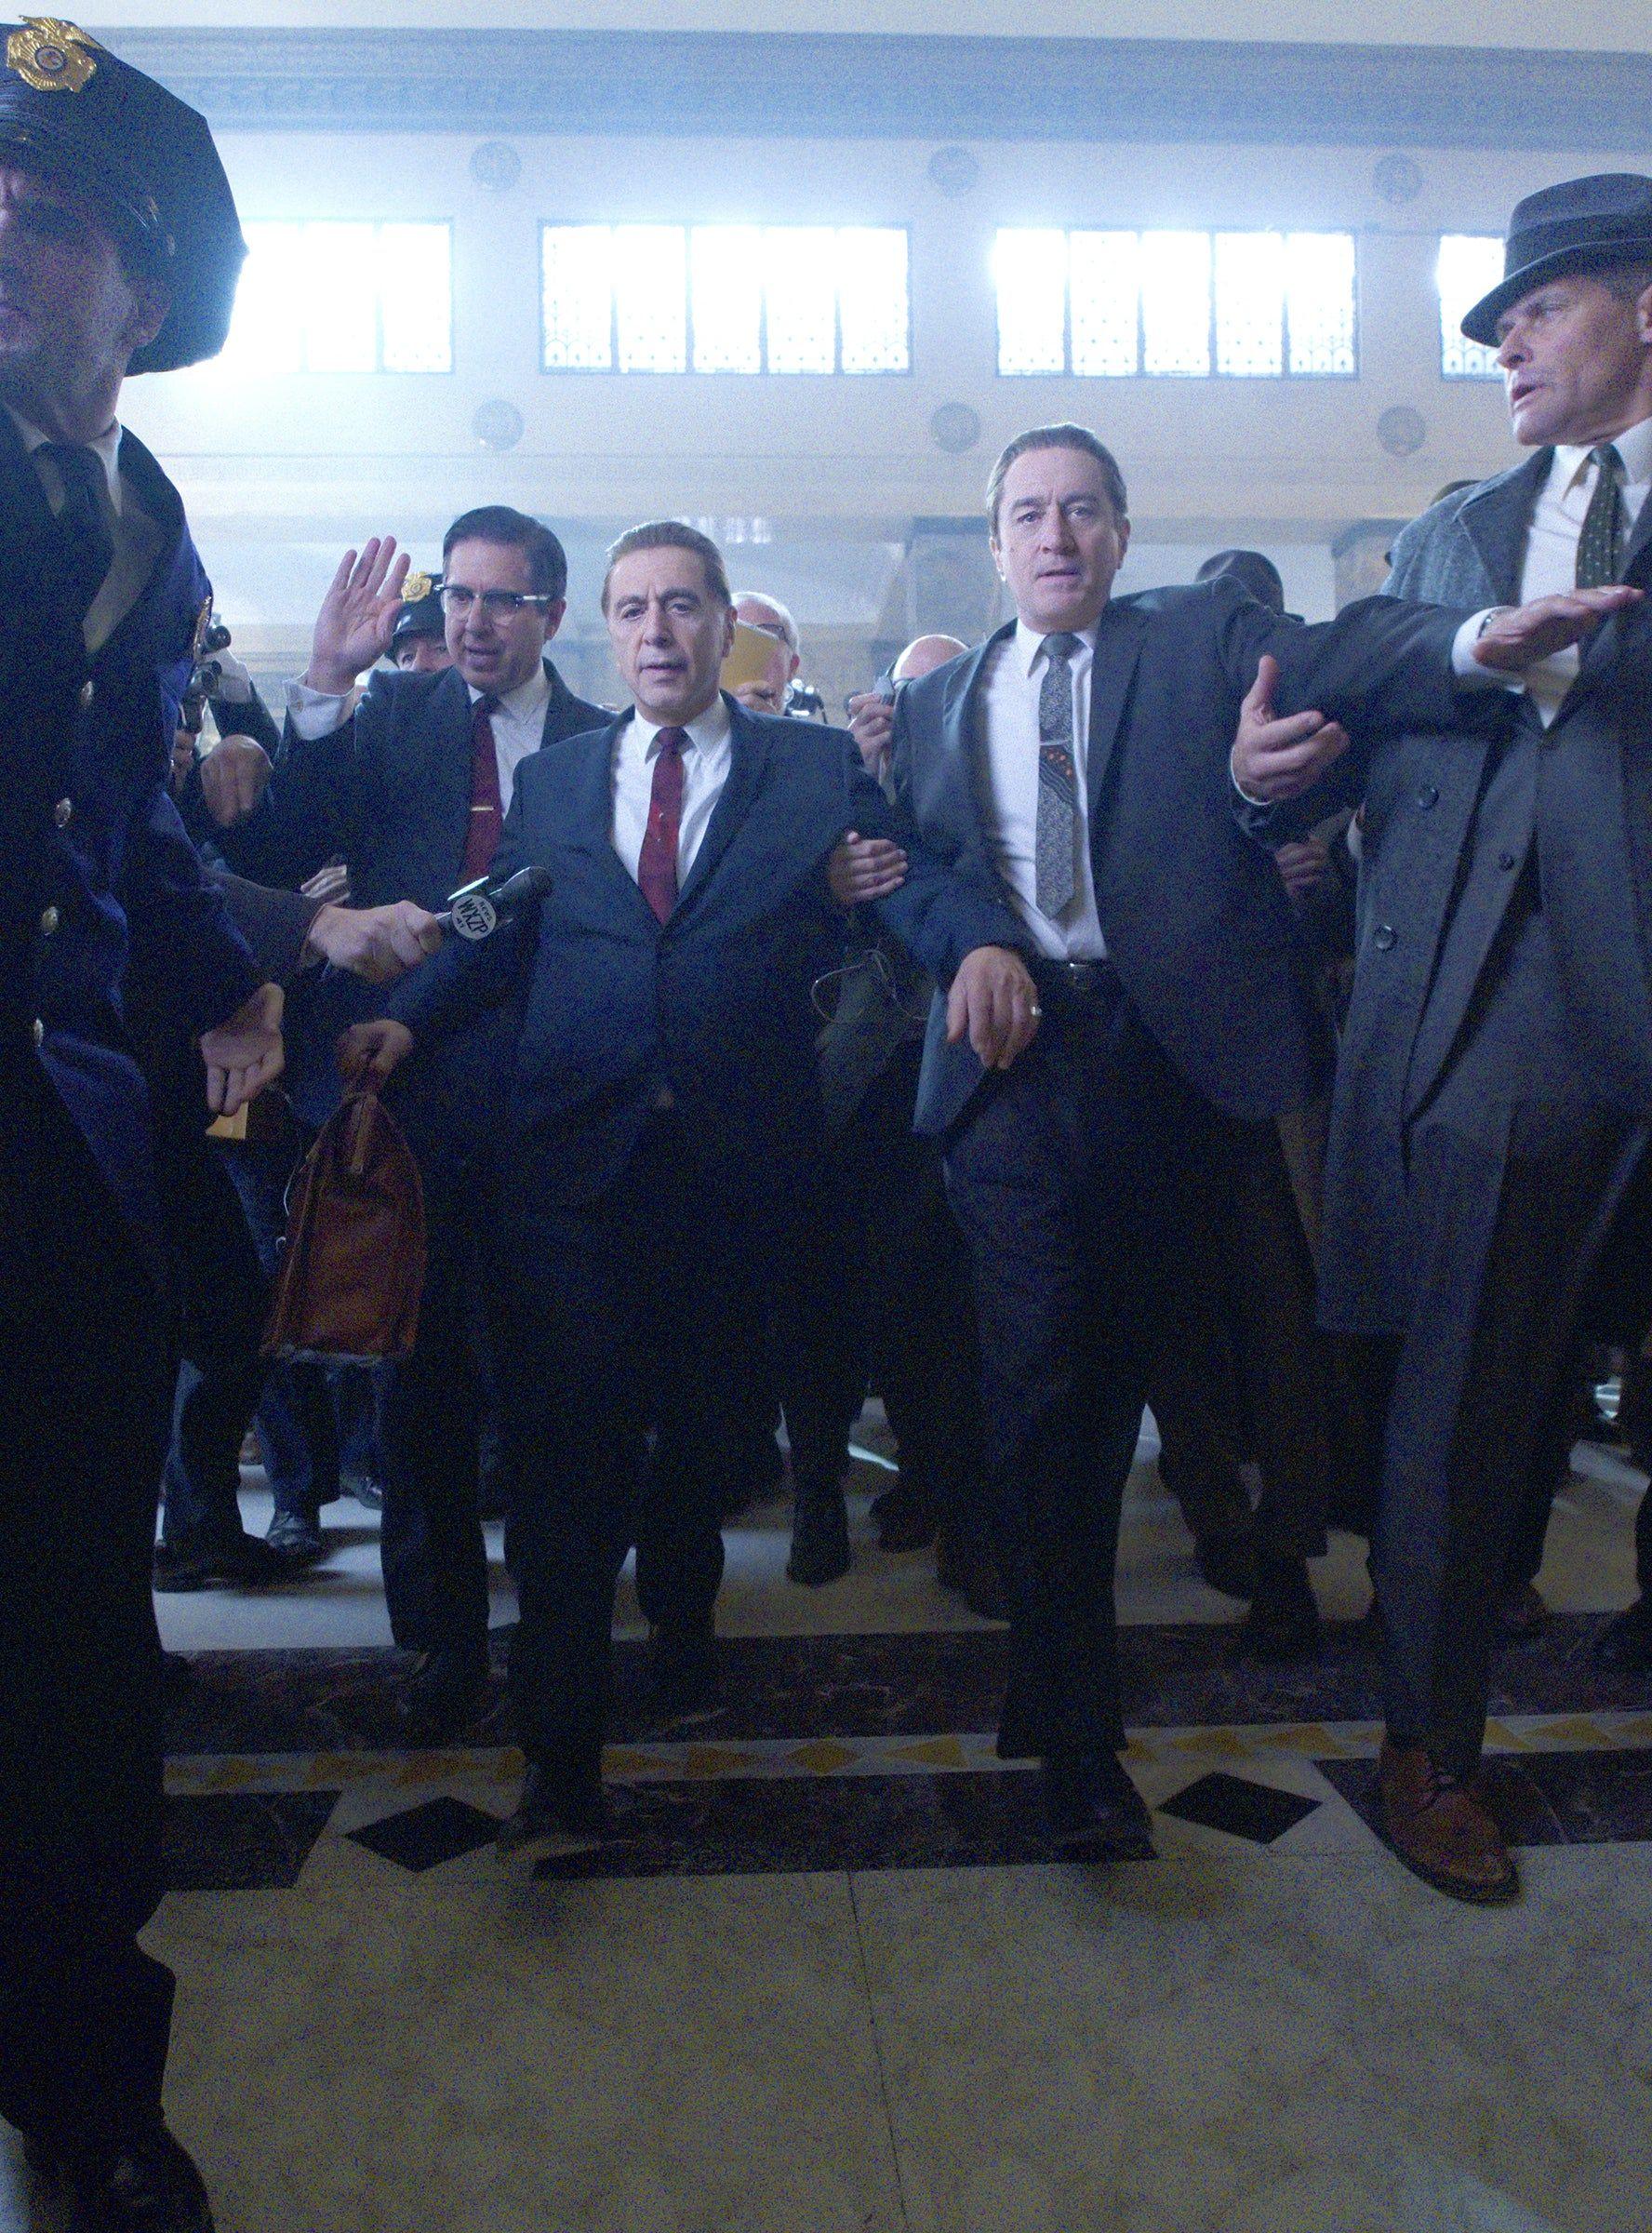 The Irishman Scorsese Streaming Vf : irishman, scorsese, streaming, Irishman, Real?, Irish, Movies,, Hollywood, Reporter